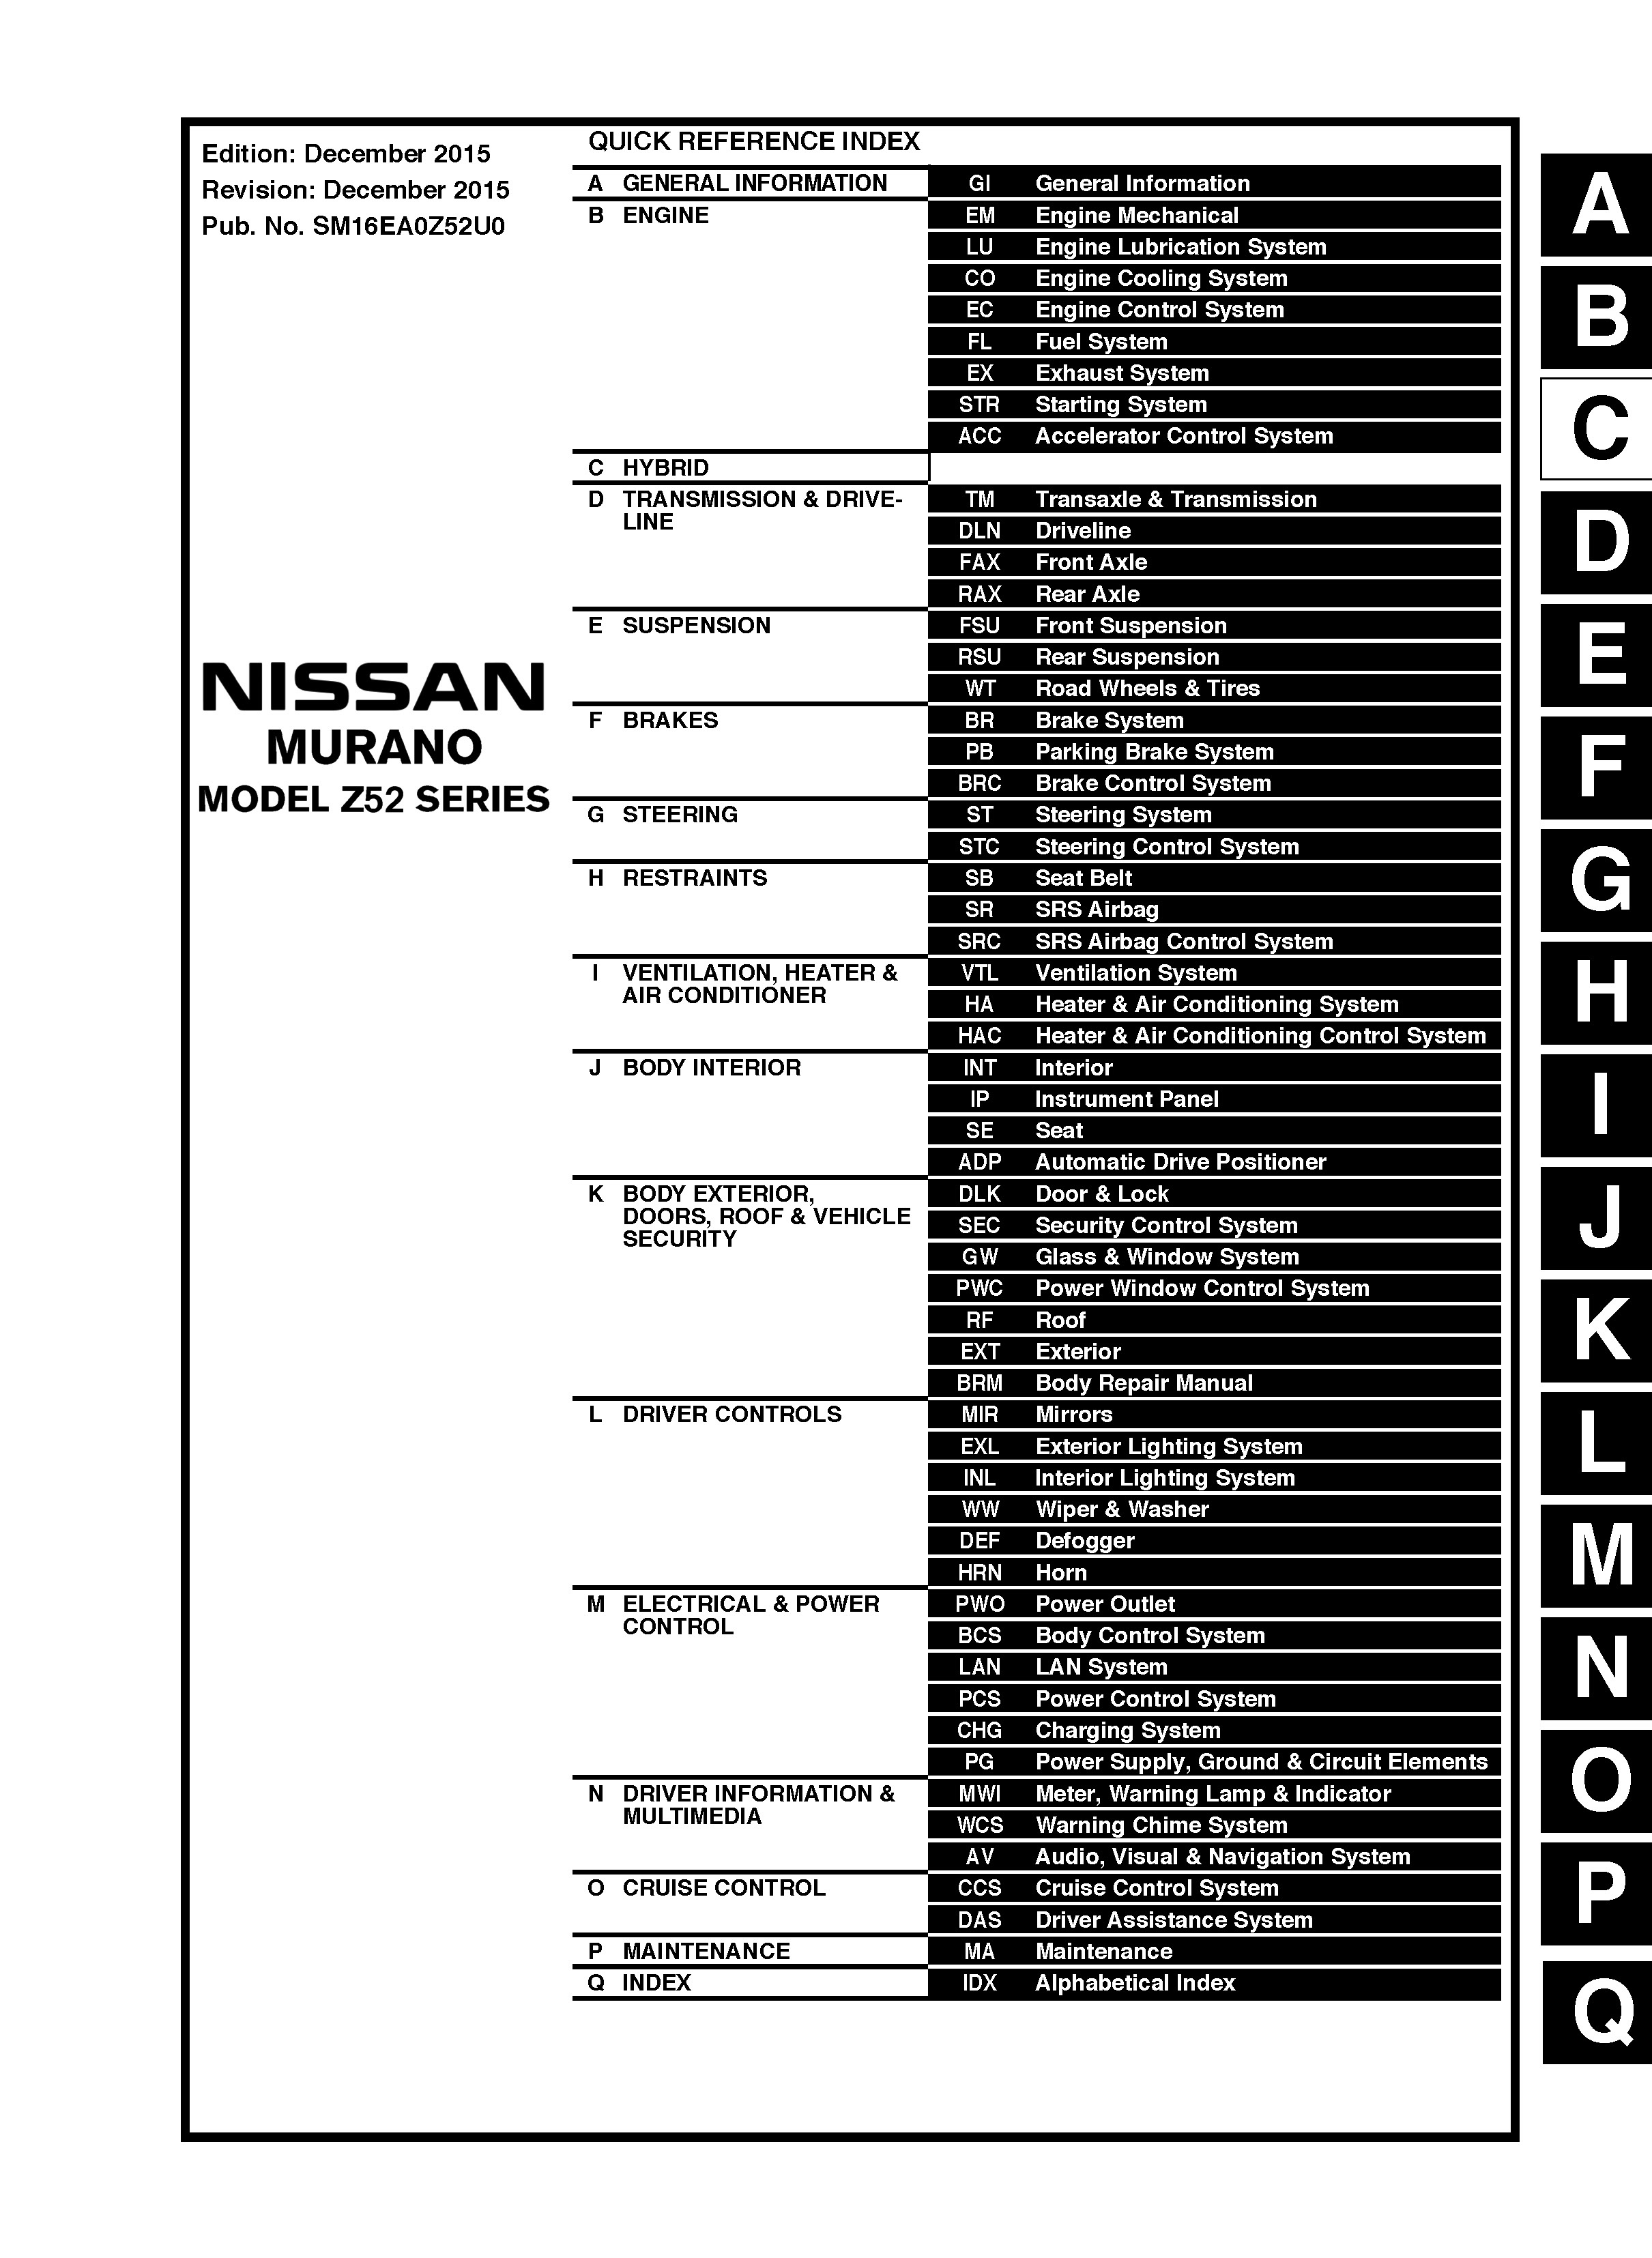 2016 Nissan Murano, Model Z52 Series, OEM Service and - OEM